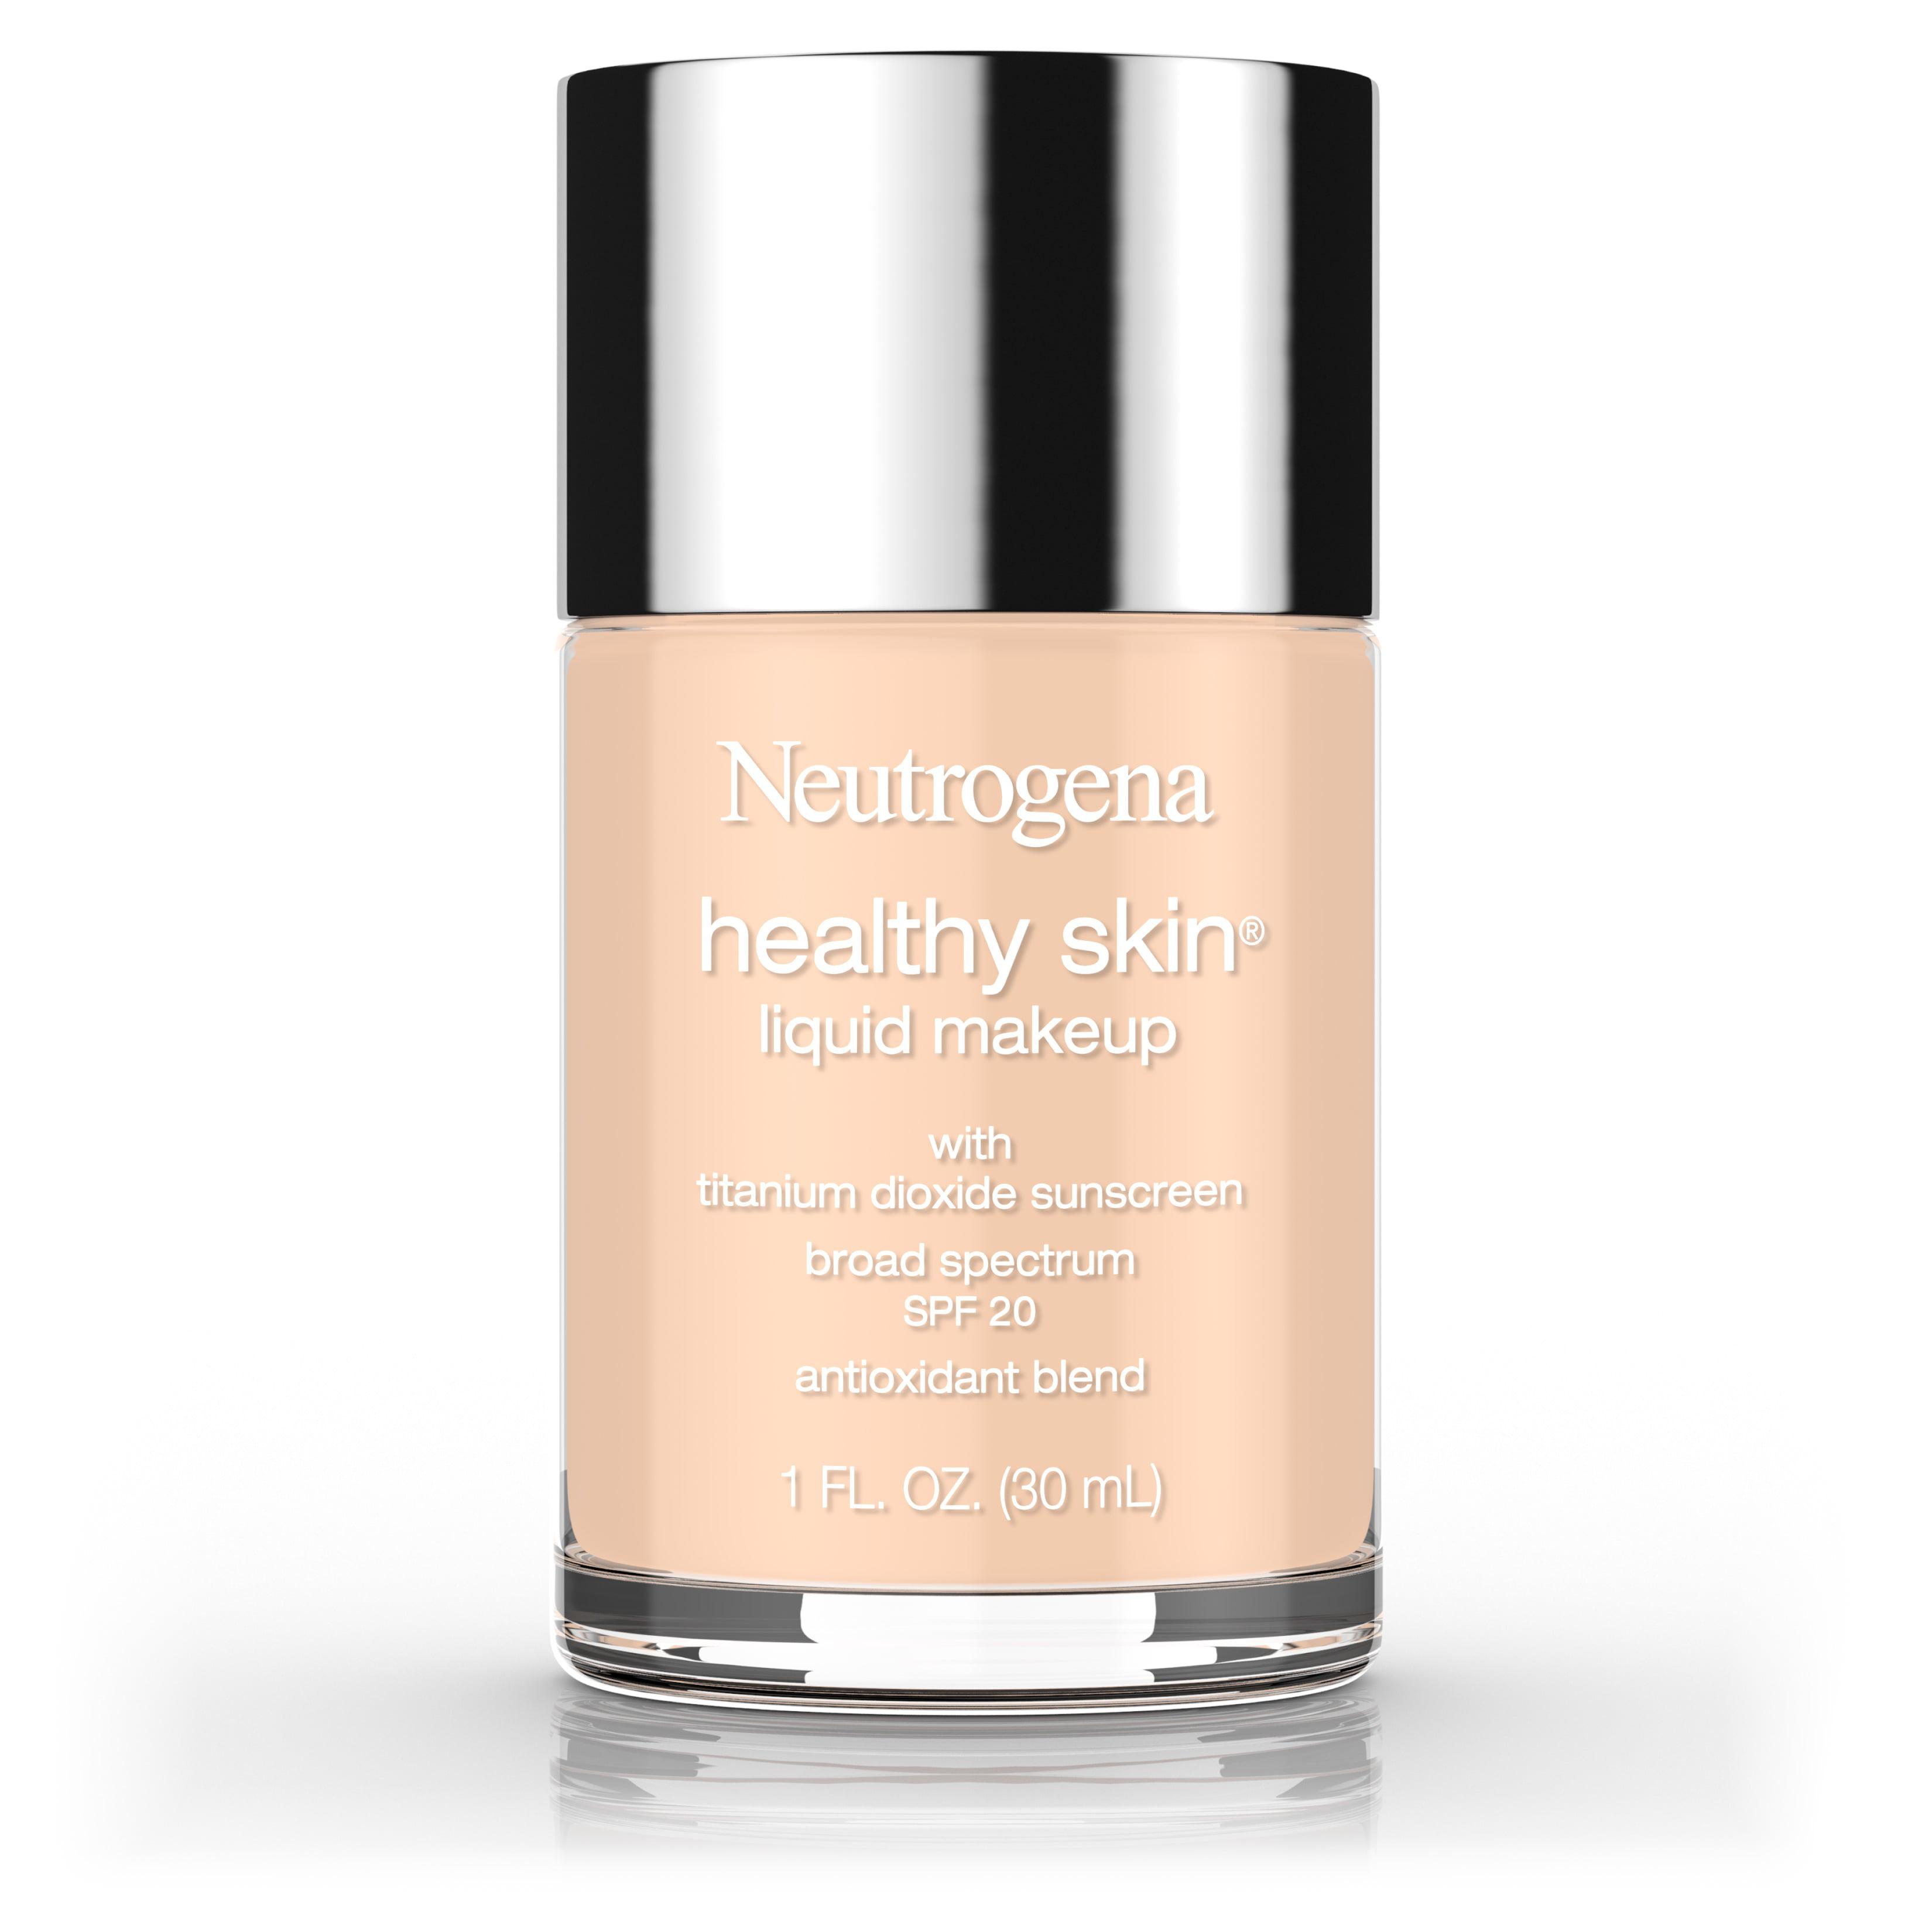 Neutrogena Healthy Skin Liquid Makeup Broad Spectrum SPF 20, 40 Nude, 1 Oz - Walmart.com